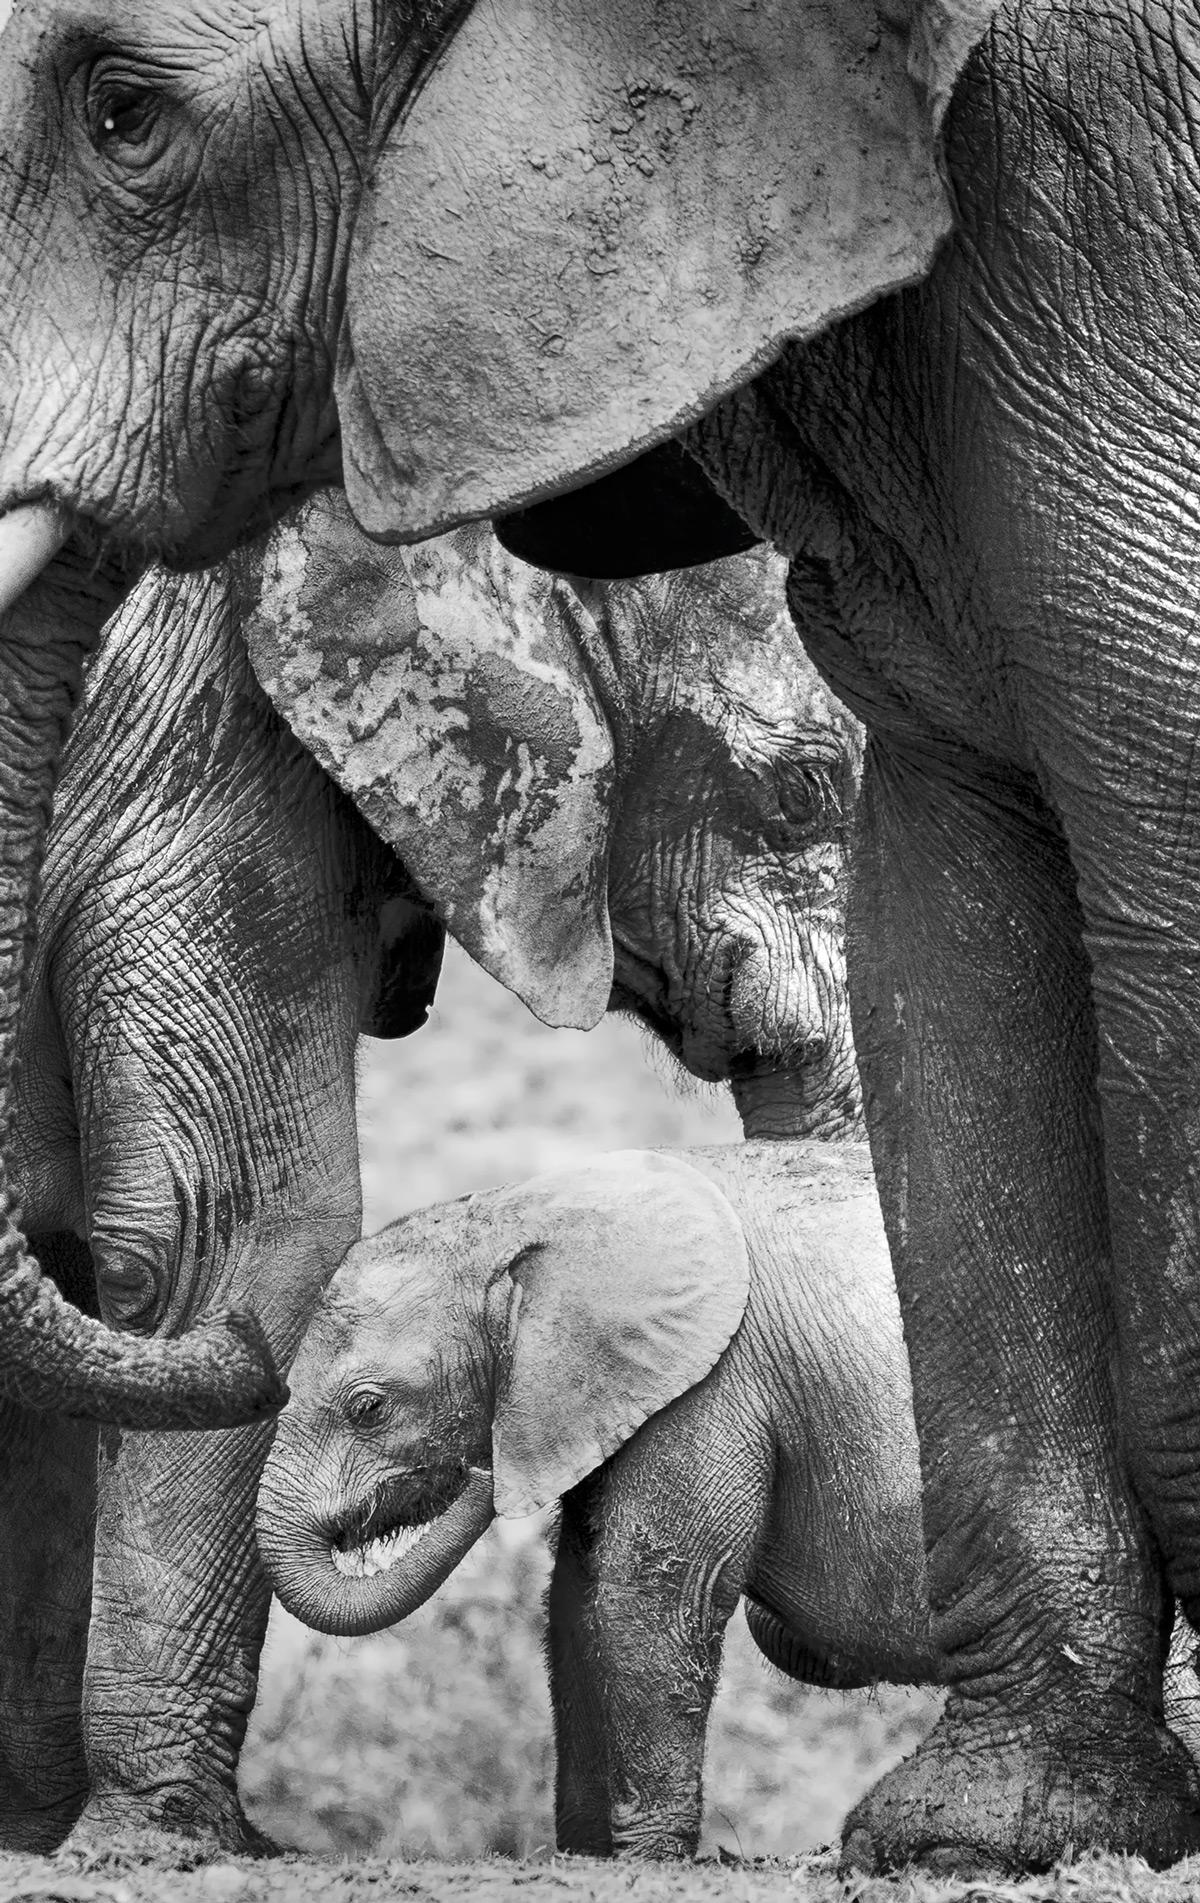 An elephant calf amongst adults in Addo Elephant National Park, South Africa © Prelena Soma Owen